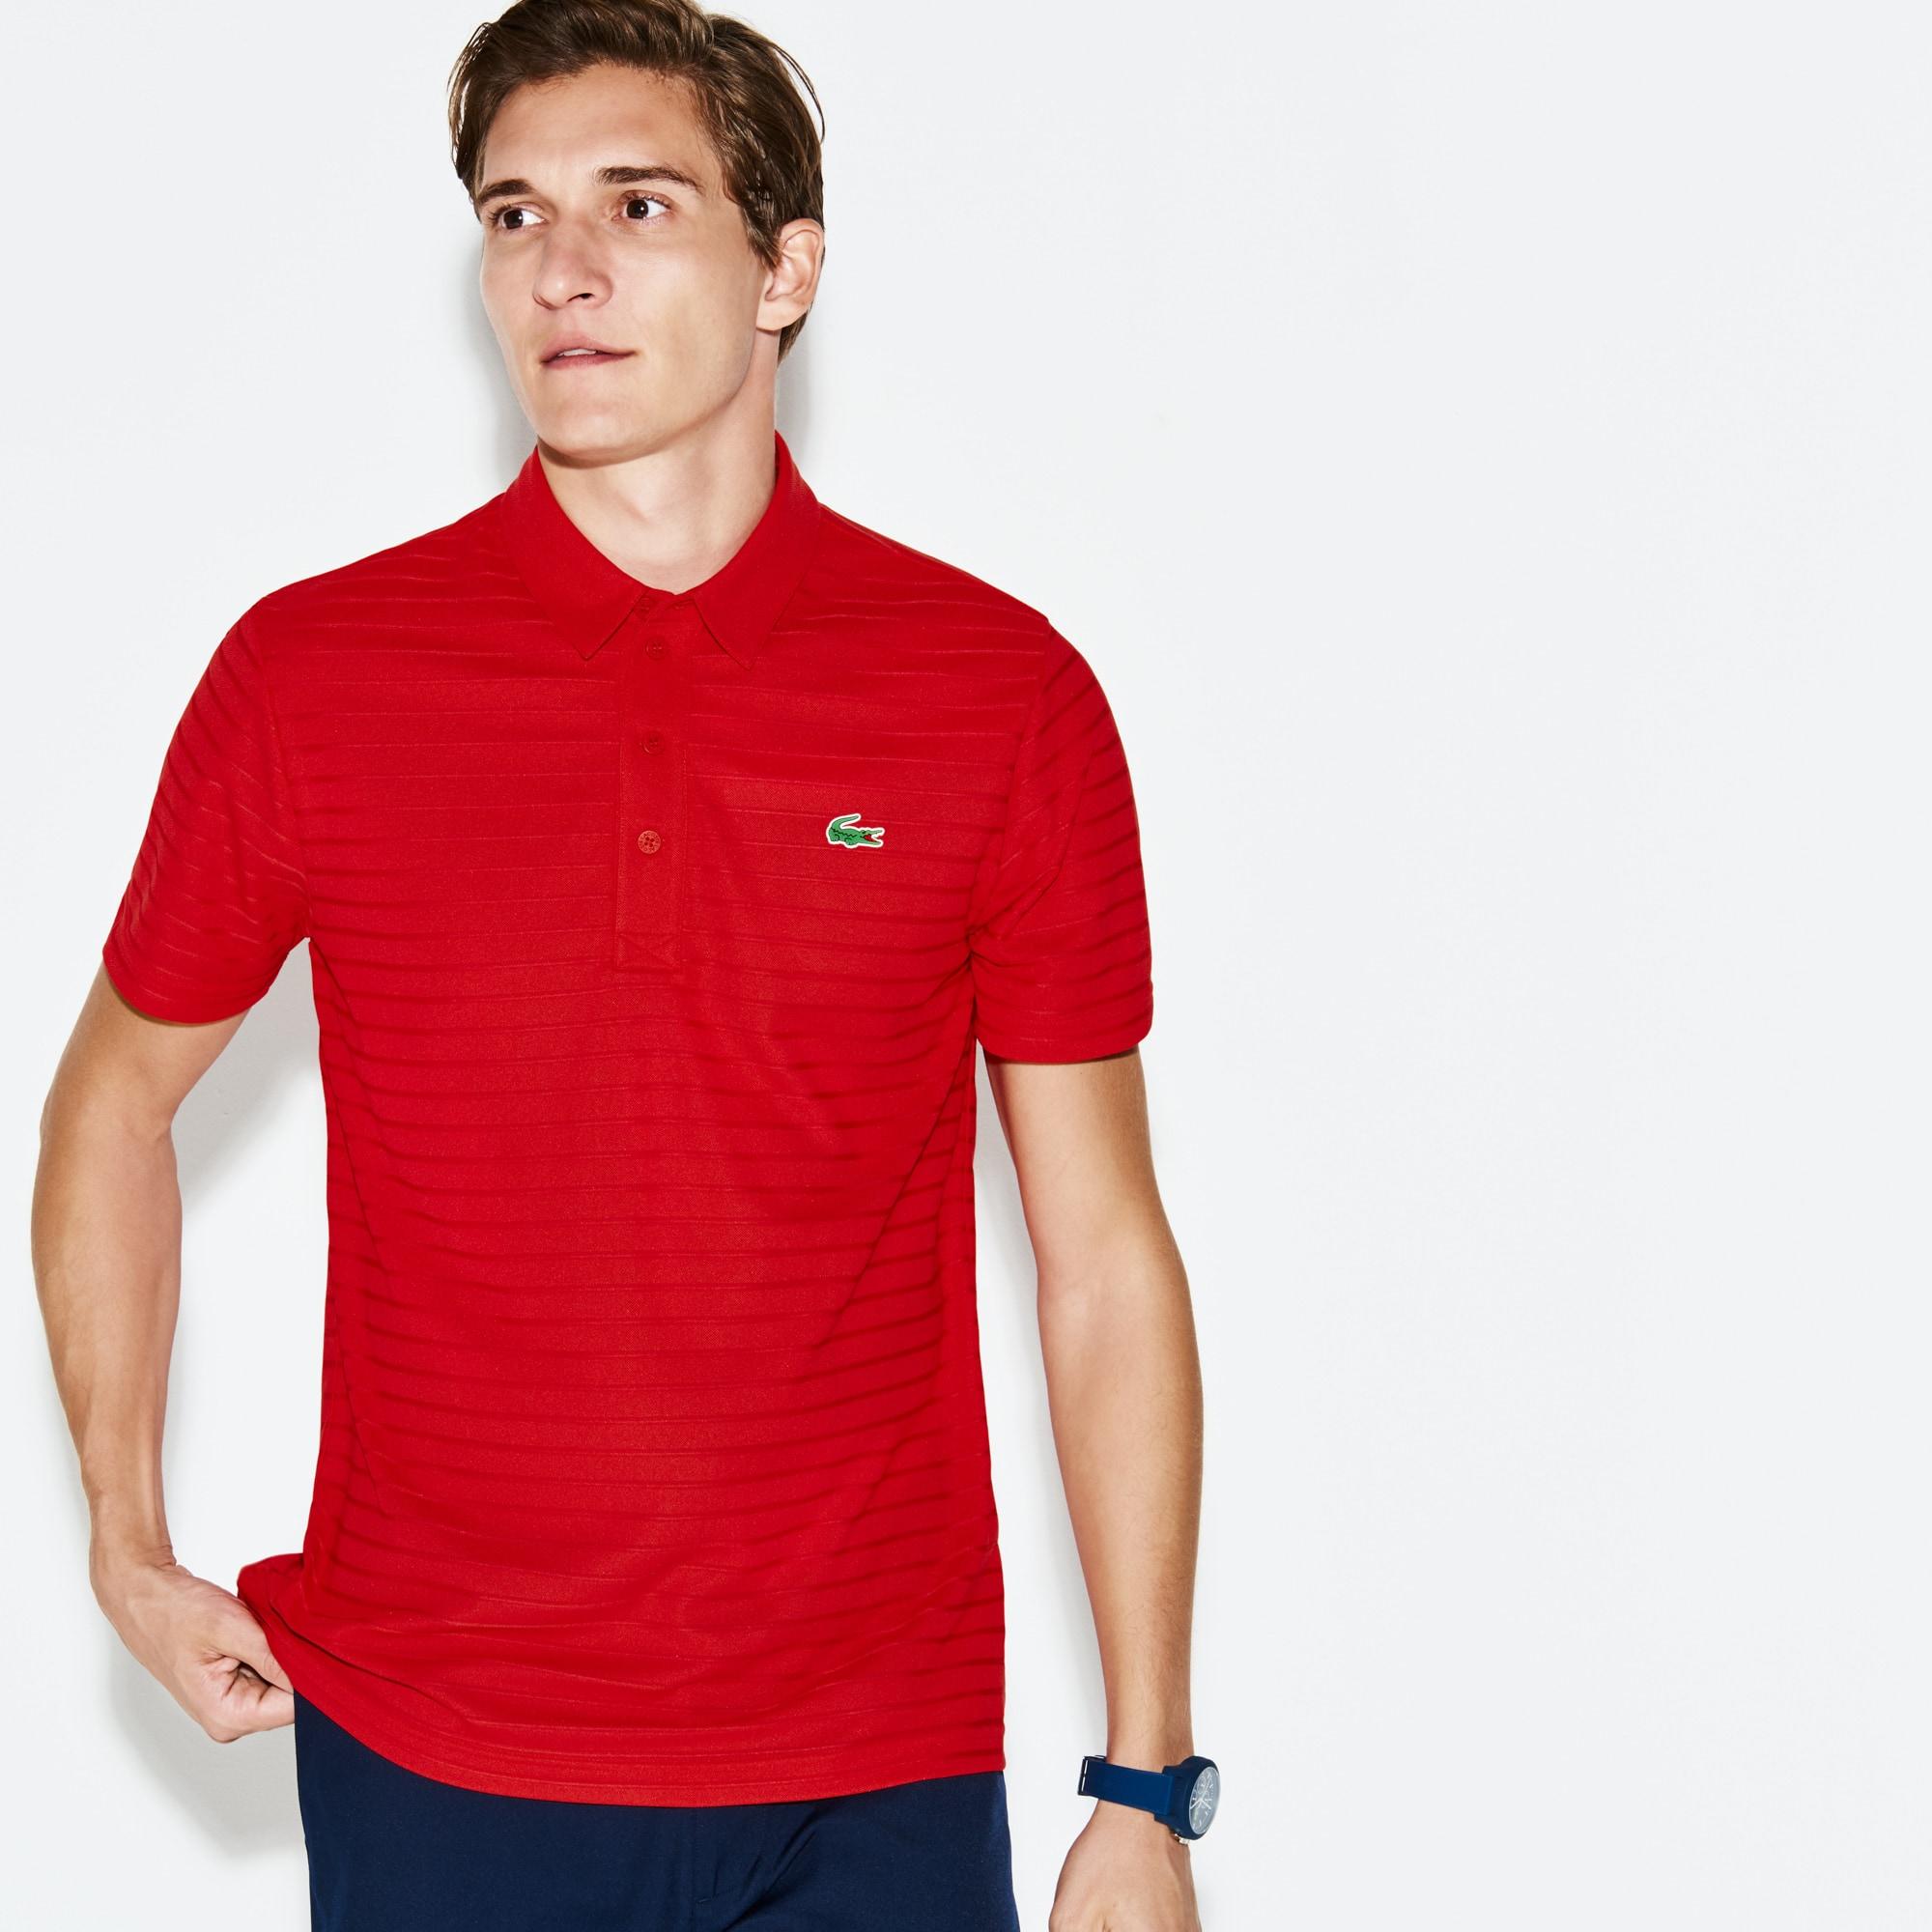 Men's  SPORT Golf Striped Tech Jacquard Jersey Polo Shirt